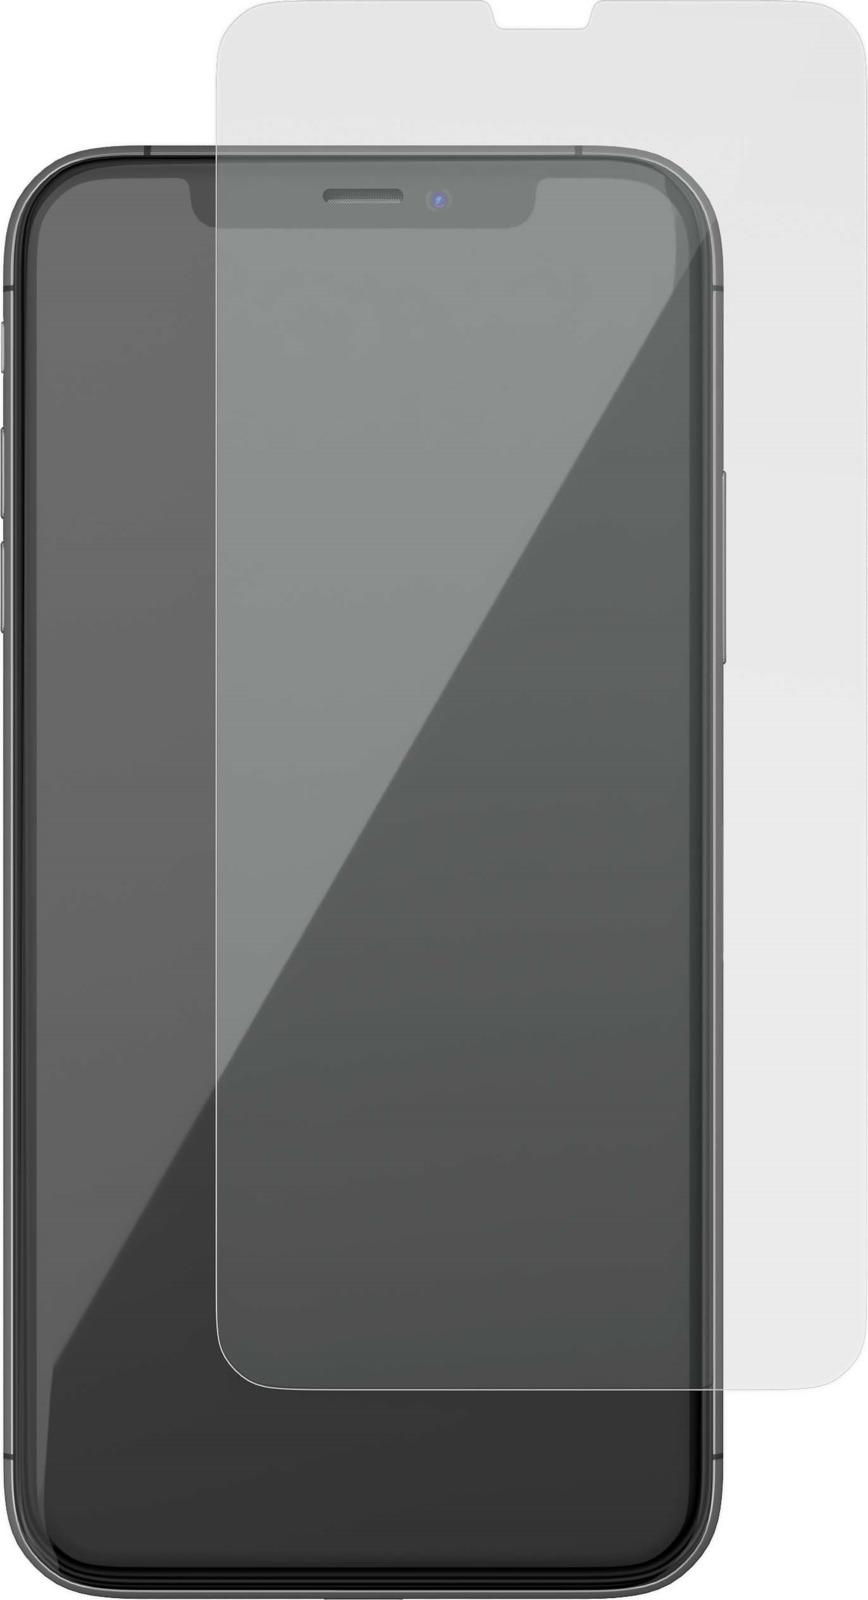 Защитное стекло uBear Premium Glass Screen Protector 0,3 мм для Apple iPhone Xs Max, прозрачный glare free screen protector with cleaning cloth for iphone 3g